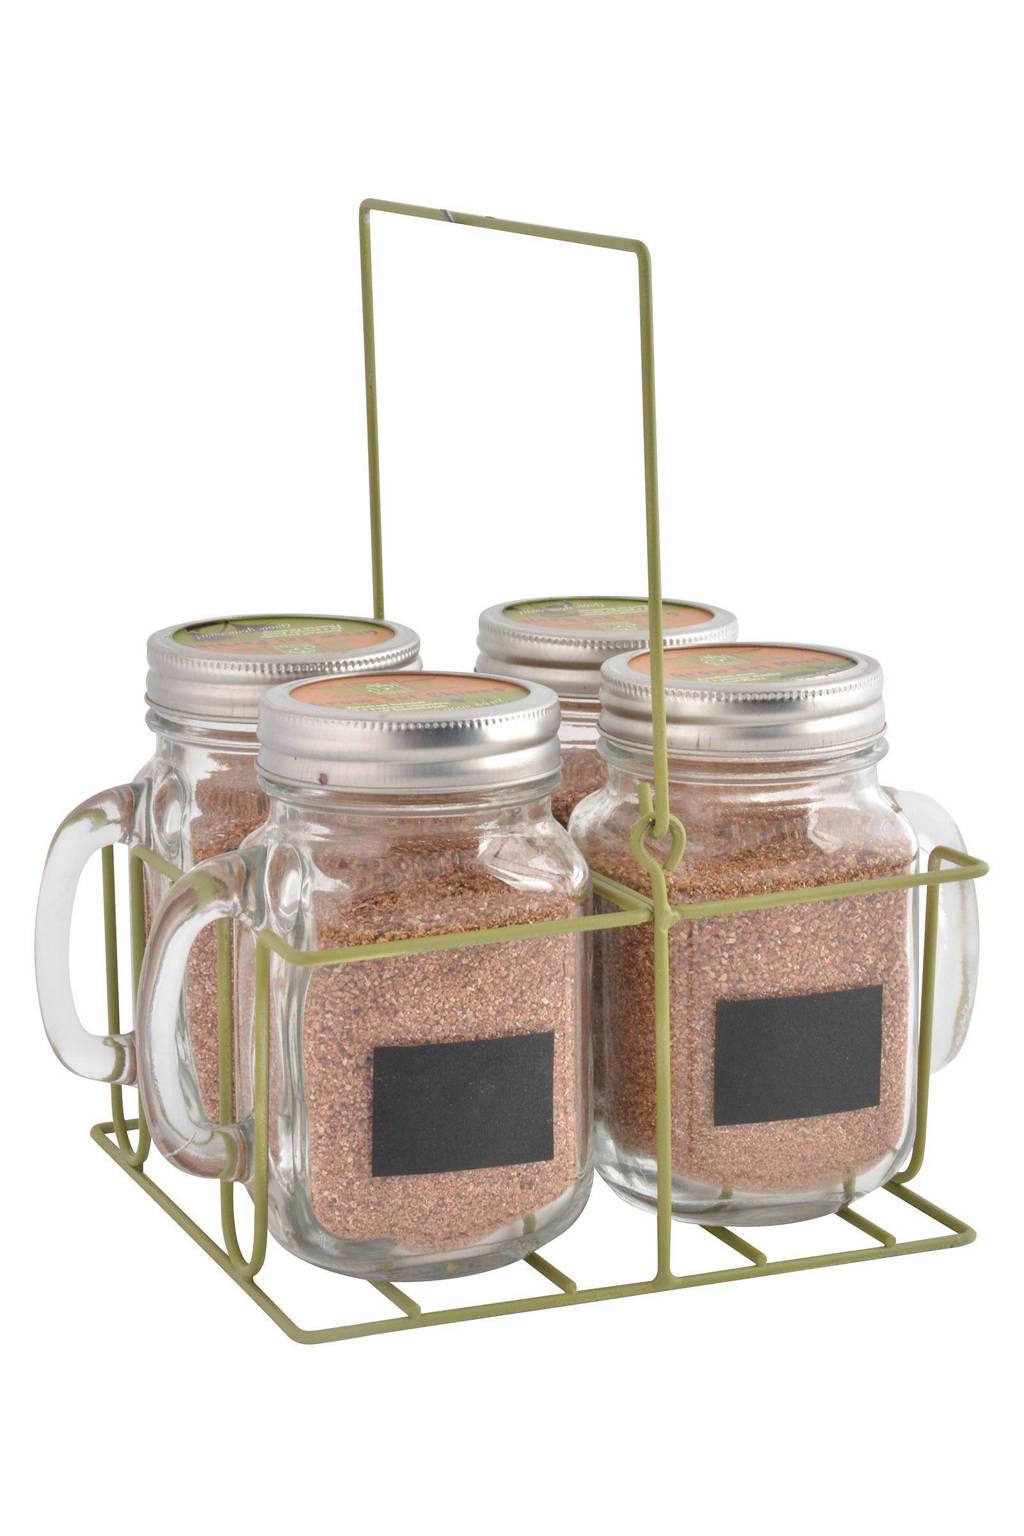 Esschert kweekset (incl. zaden), Transparant